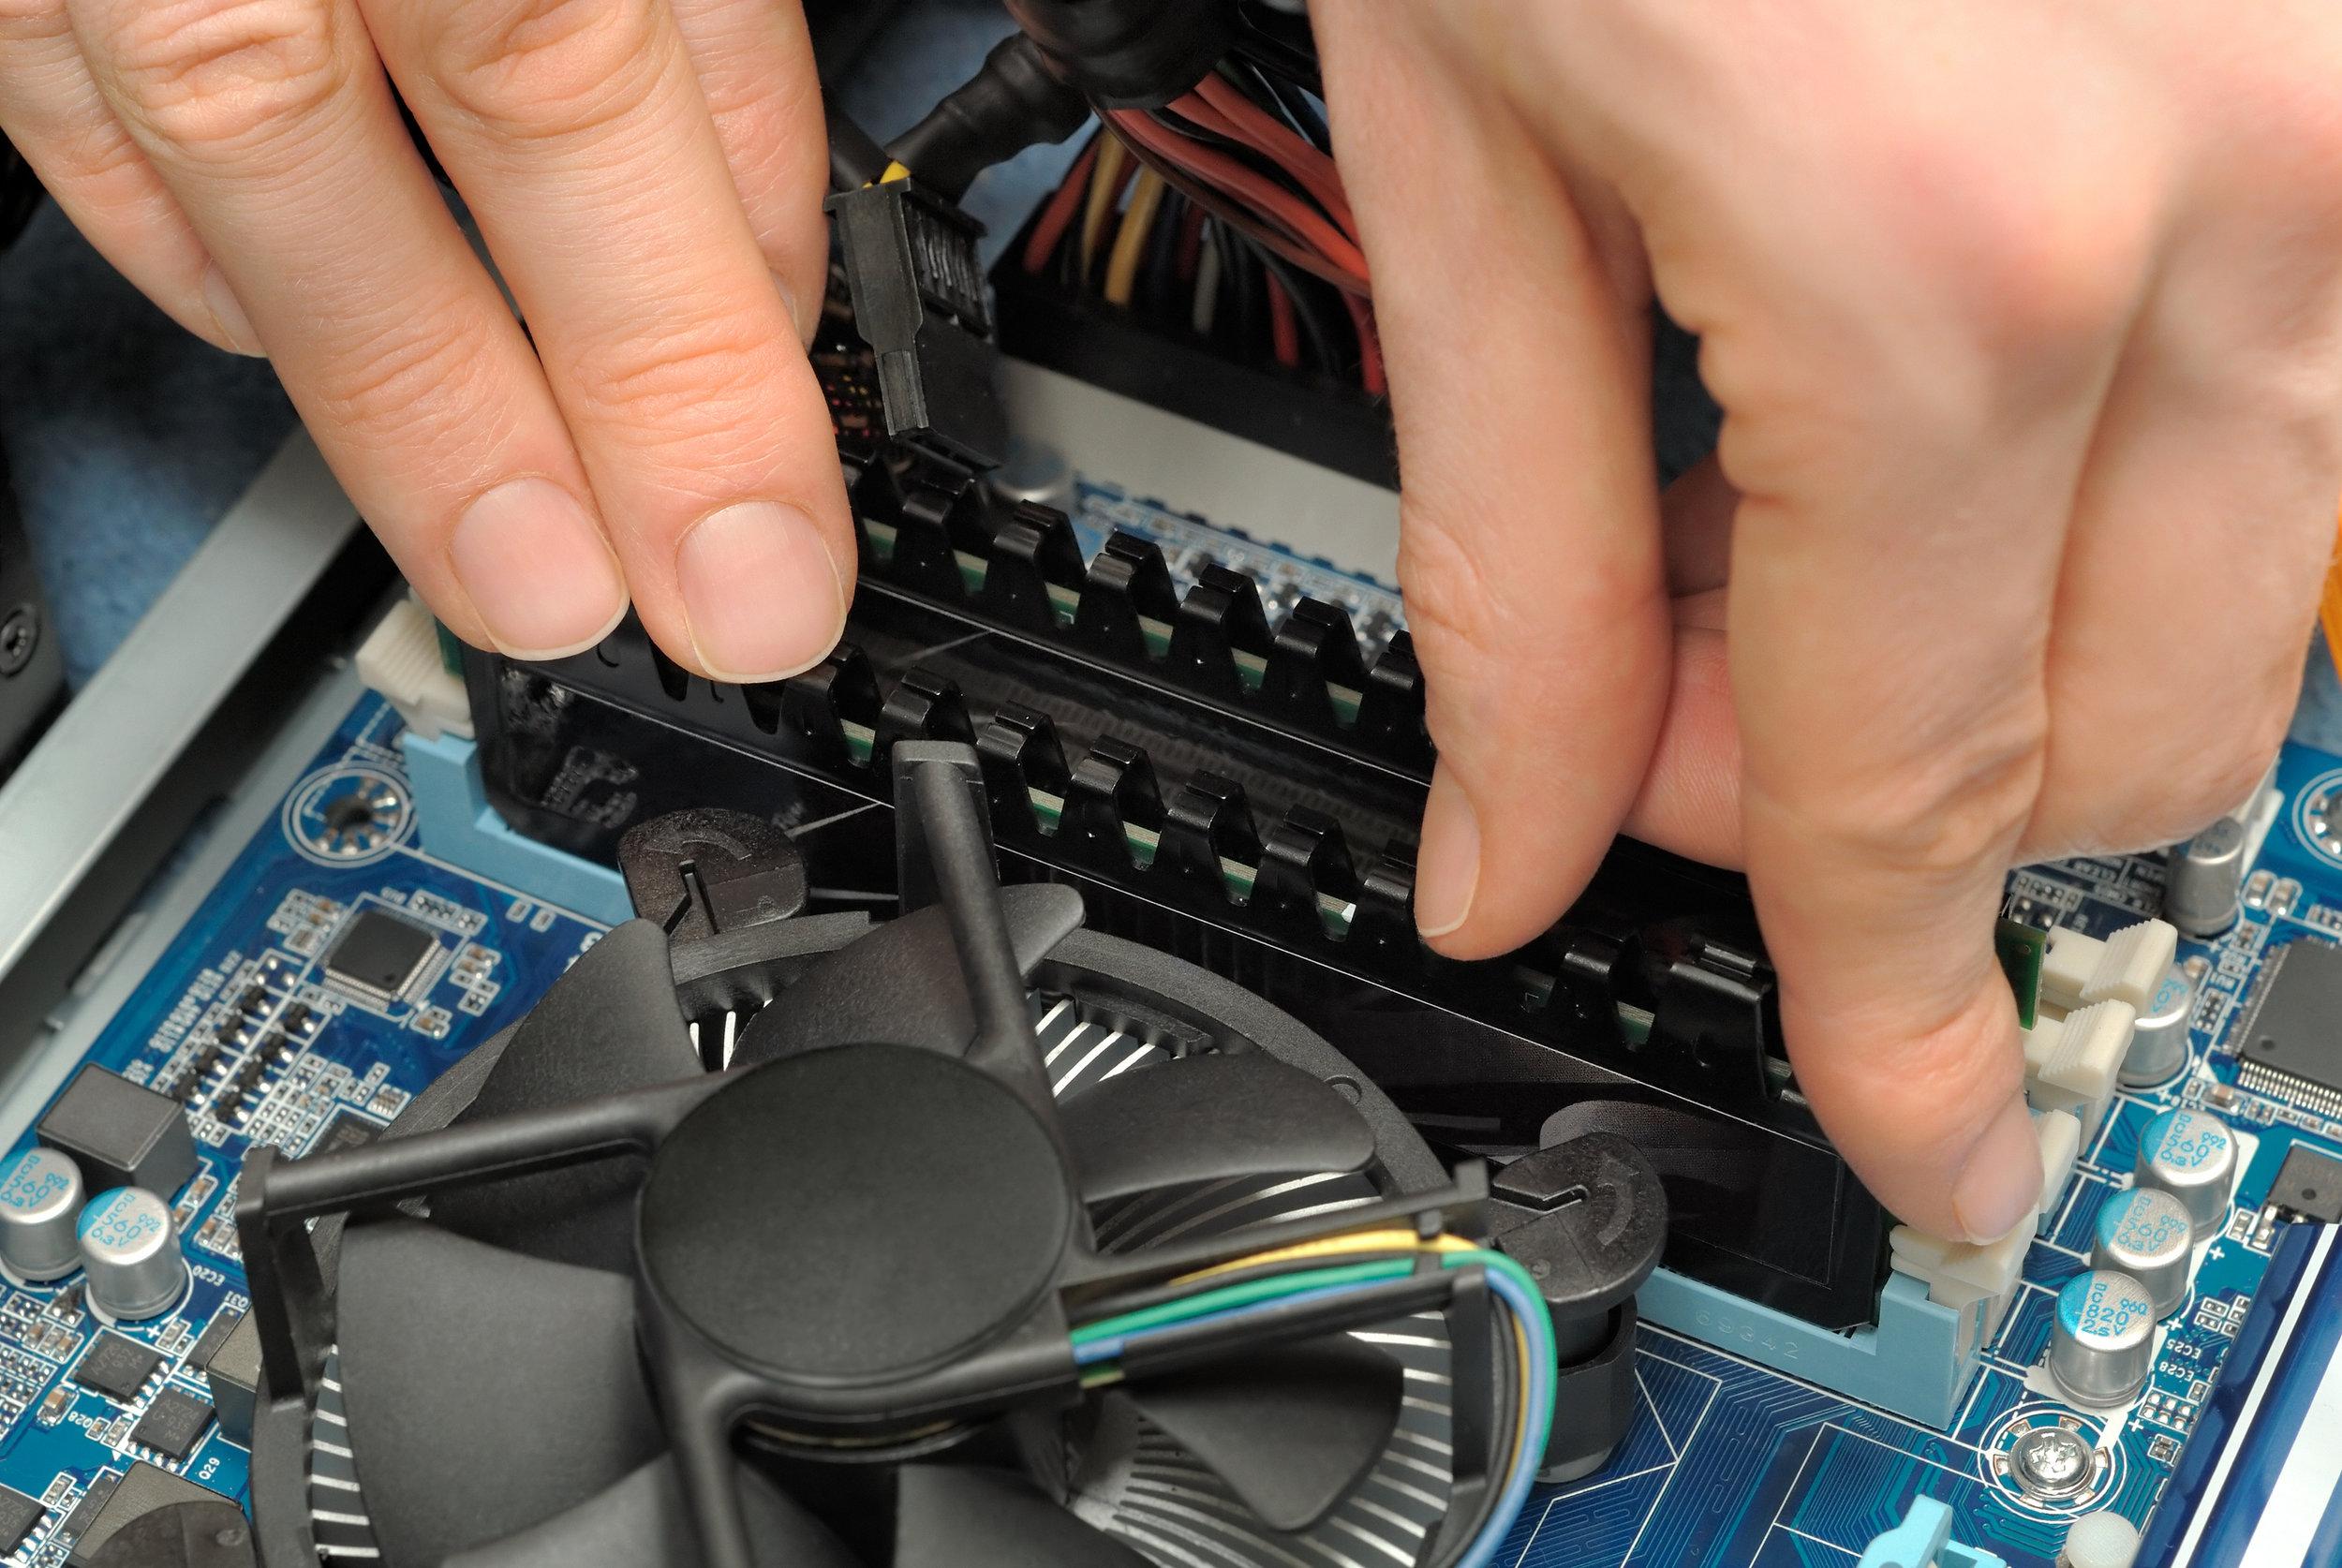 bigstock-Hands-Installing-Computer-Part-7968816.jpg